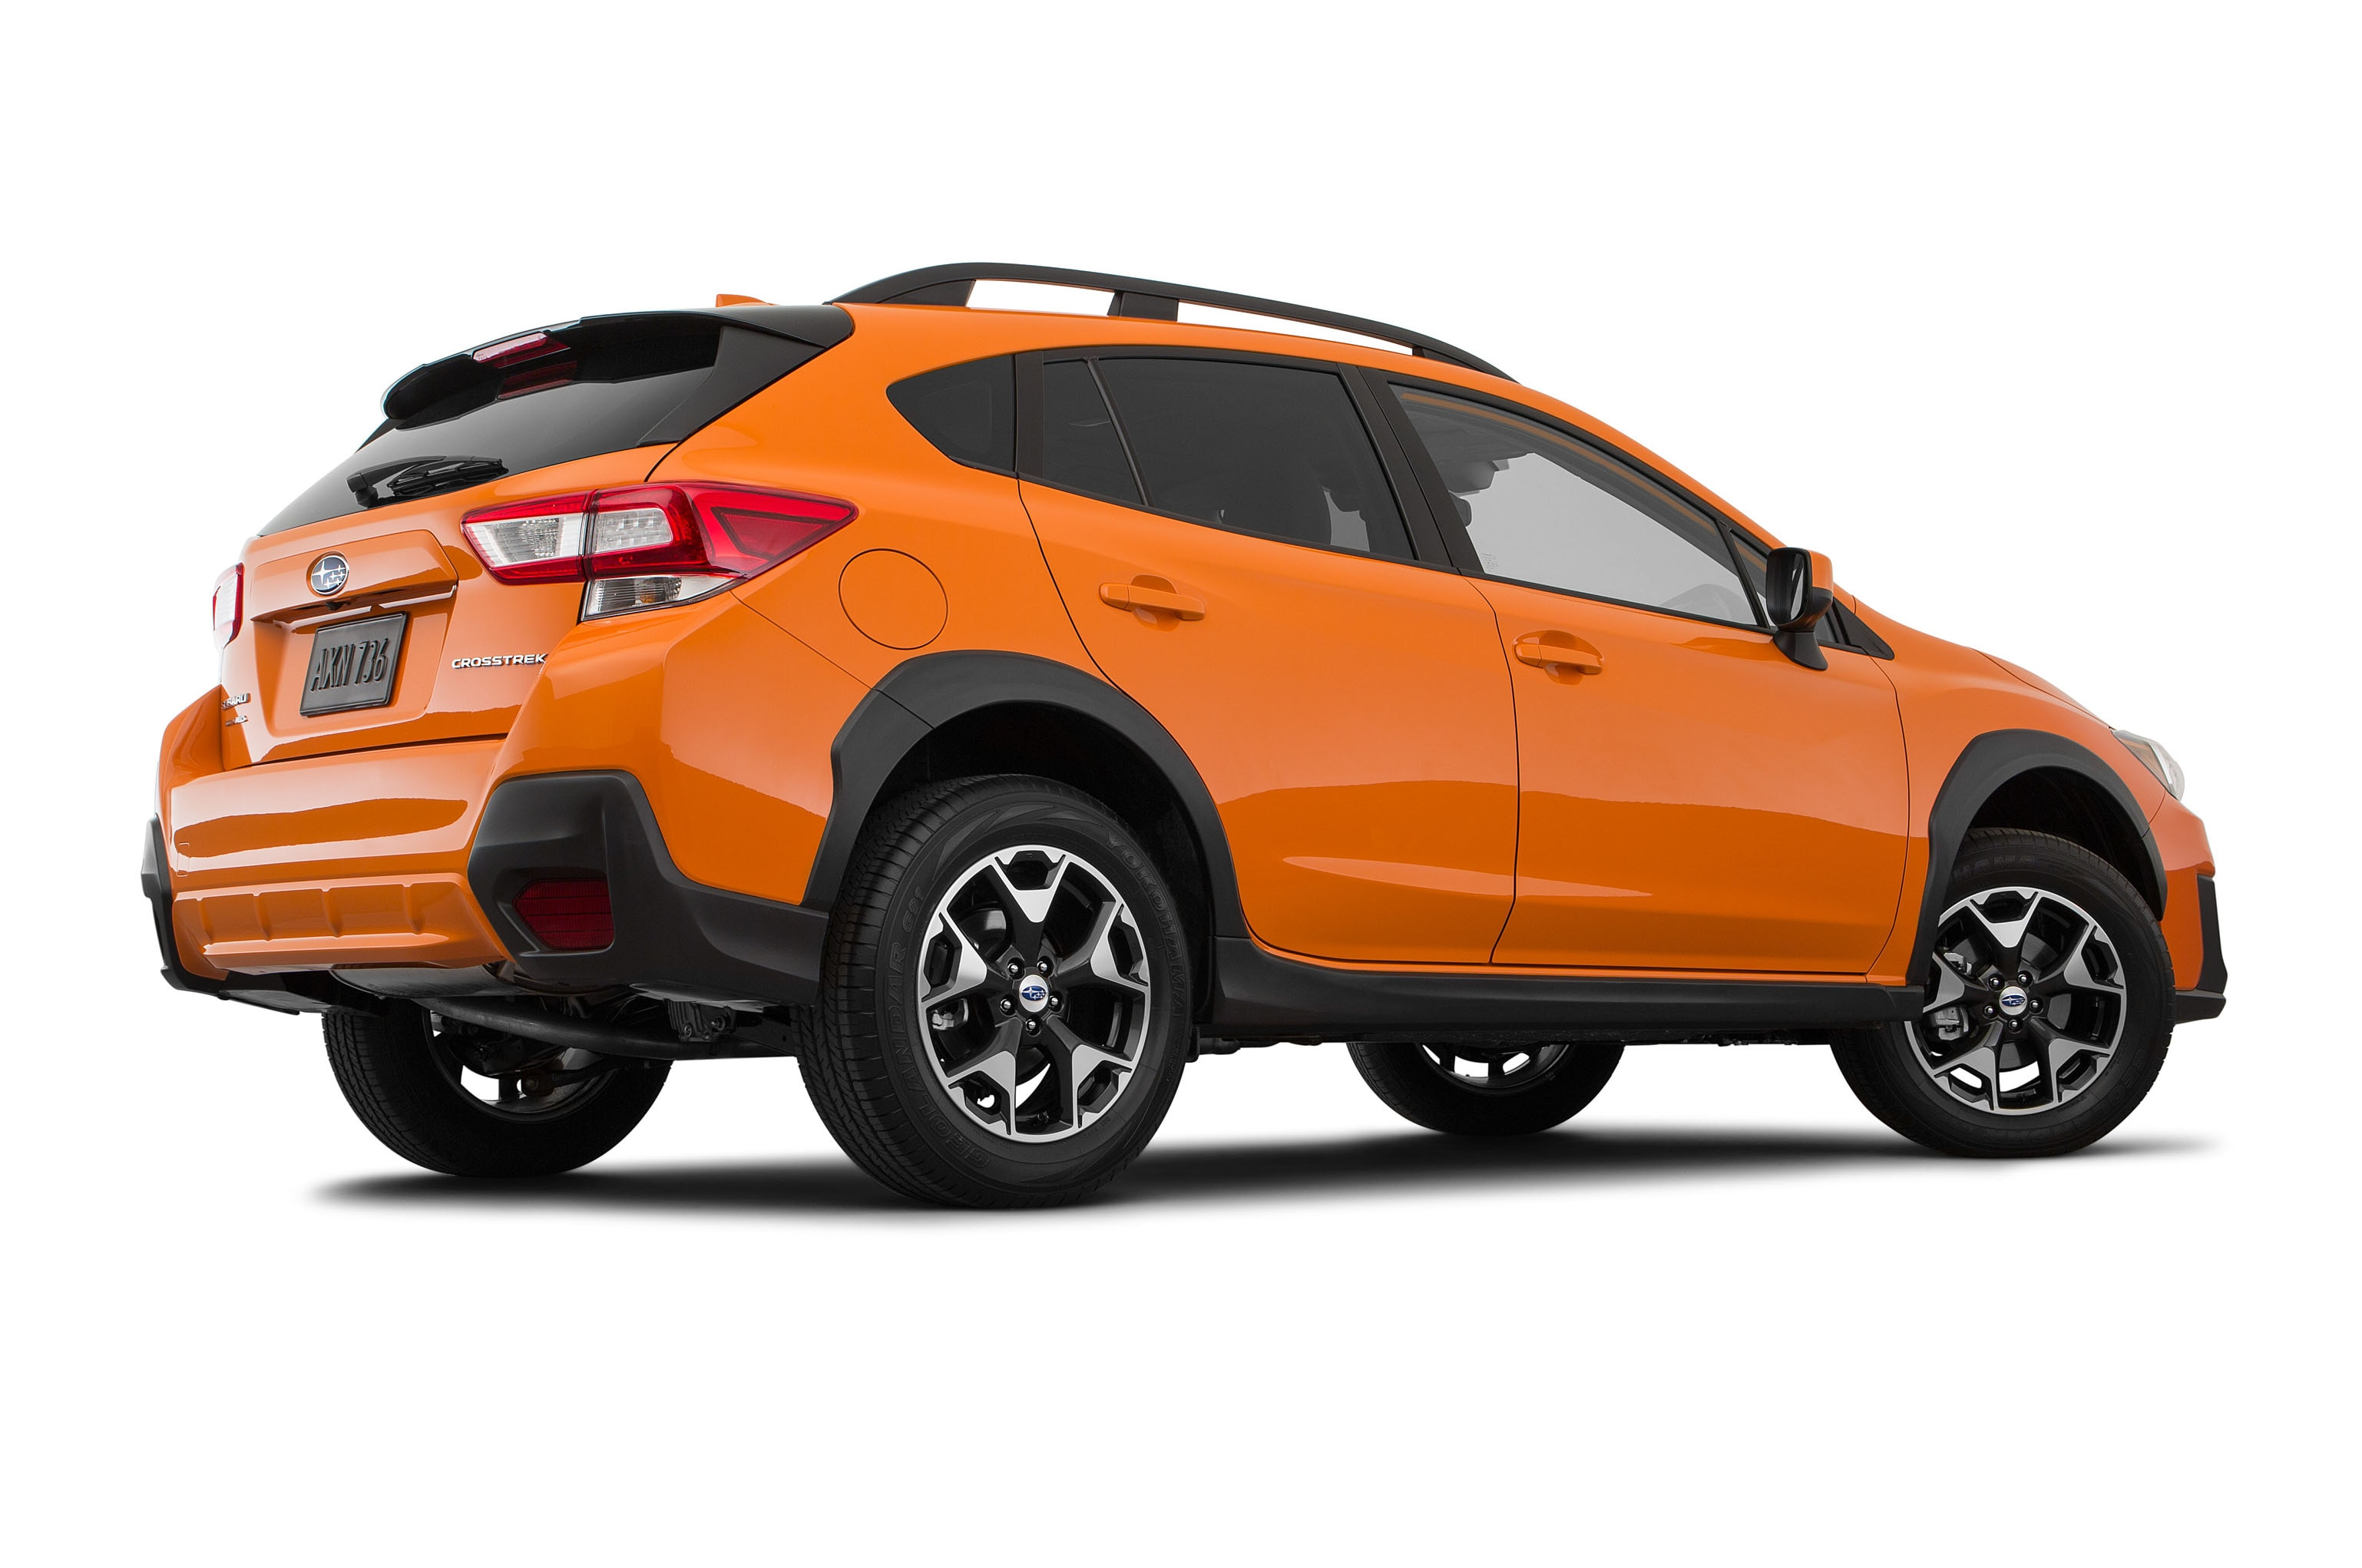 2019 Subaru Crosstrek Priced to Start at $22,870 ...